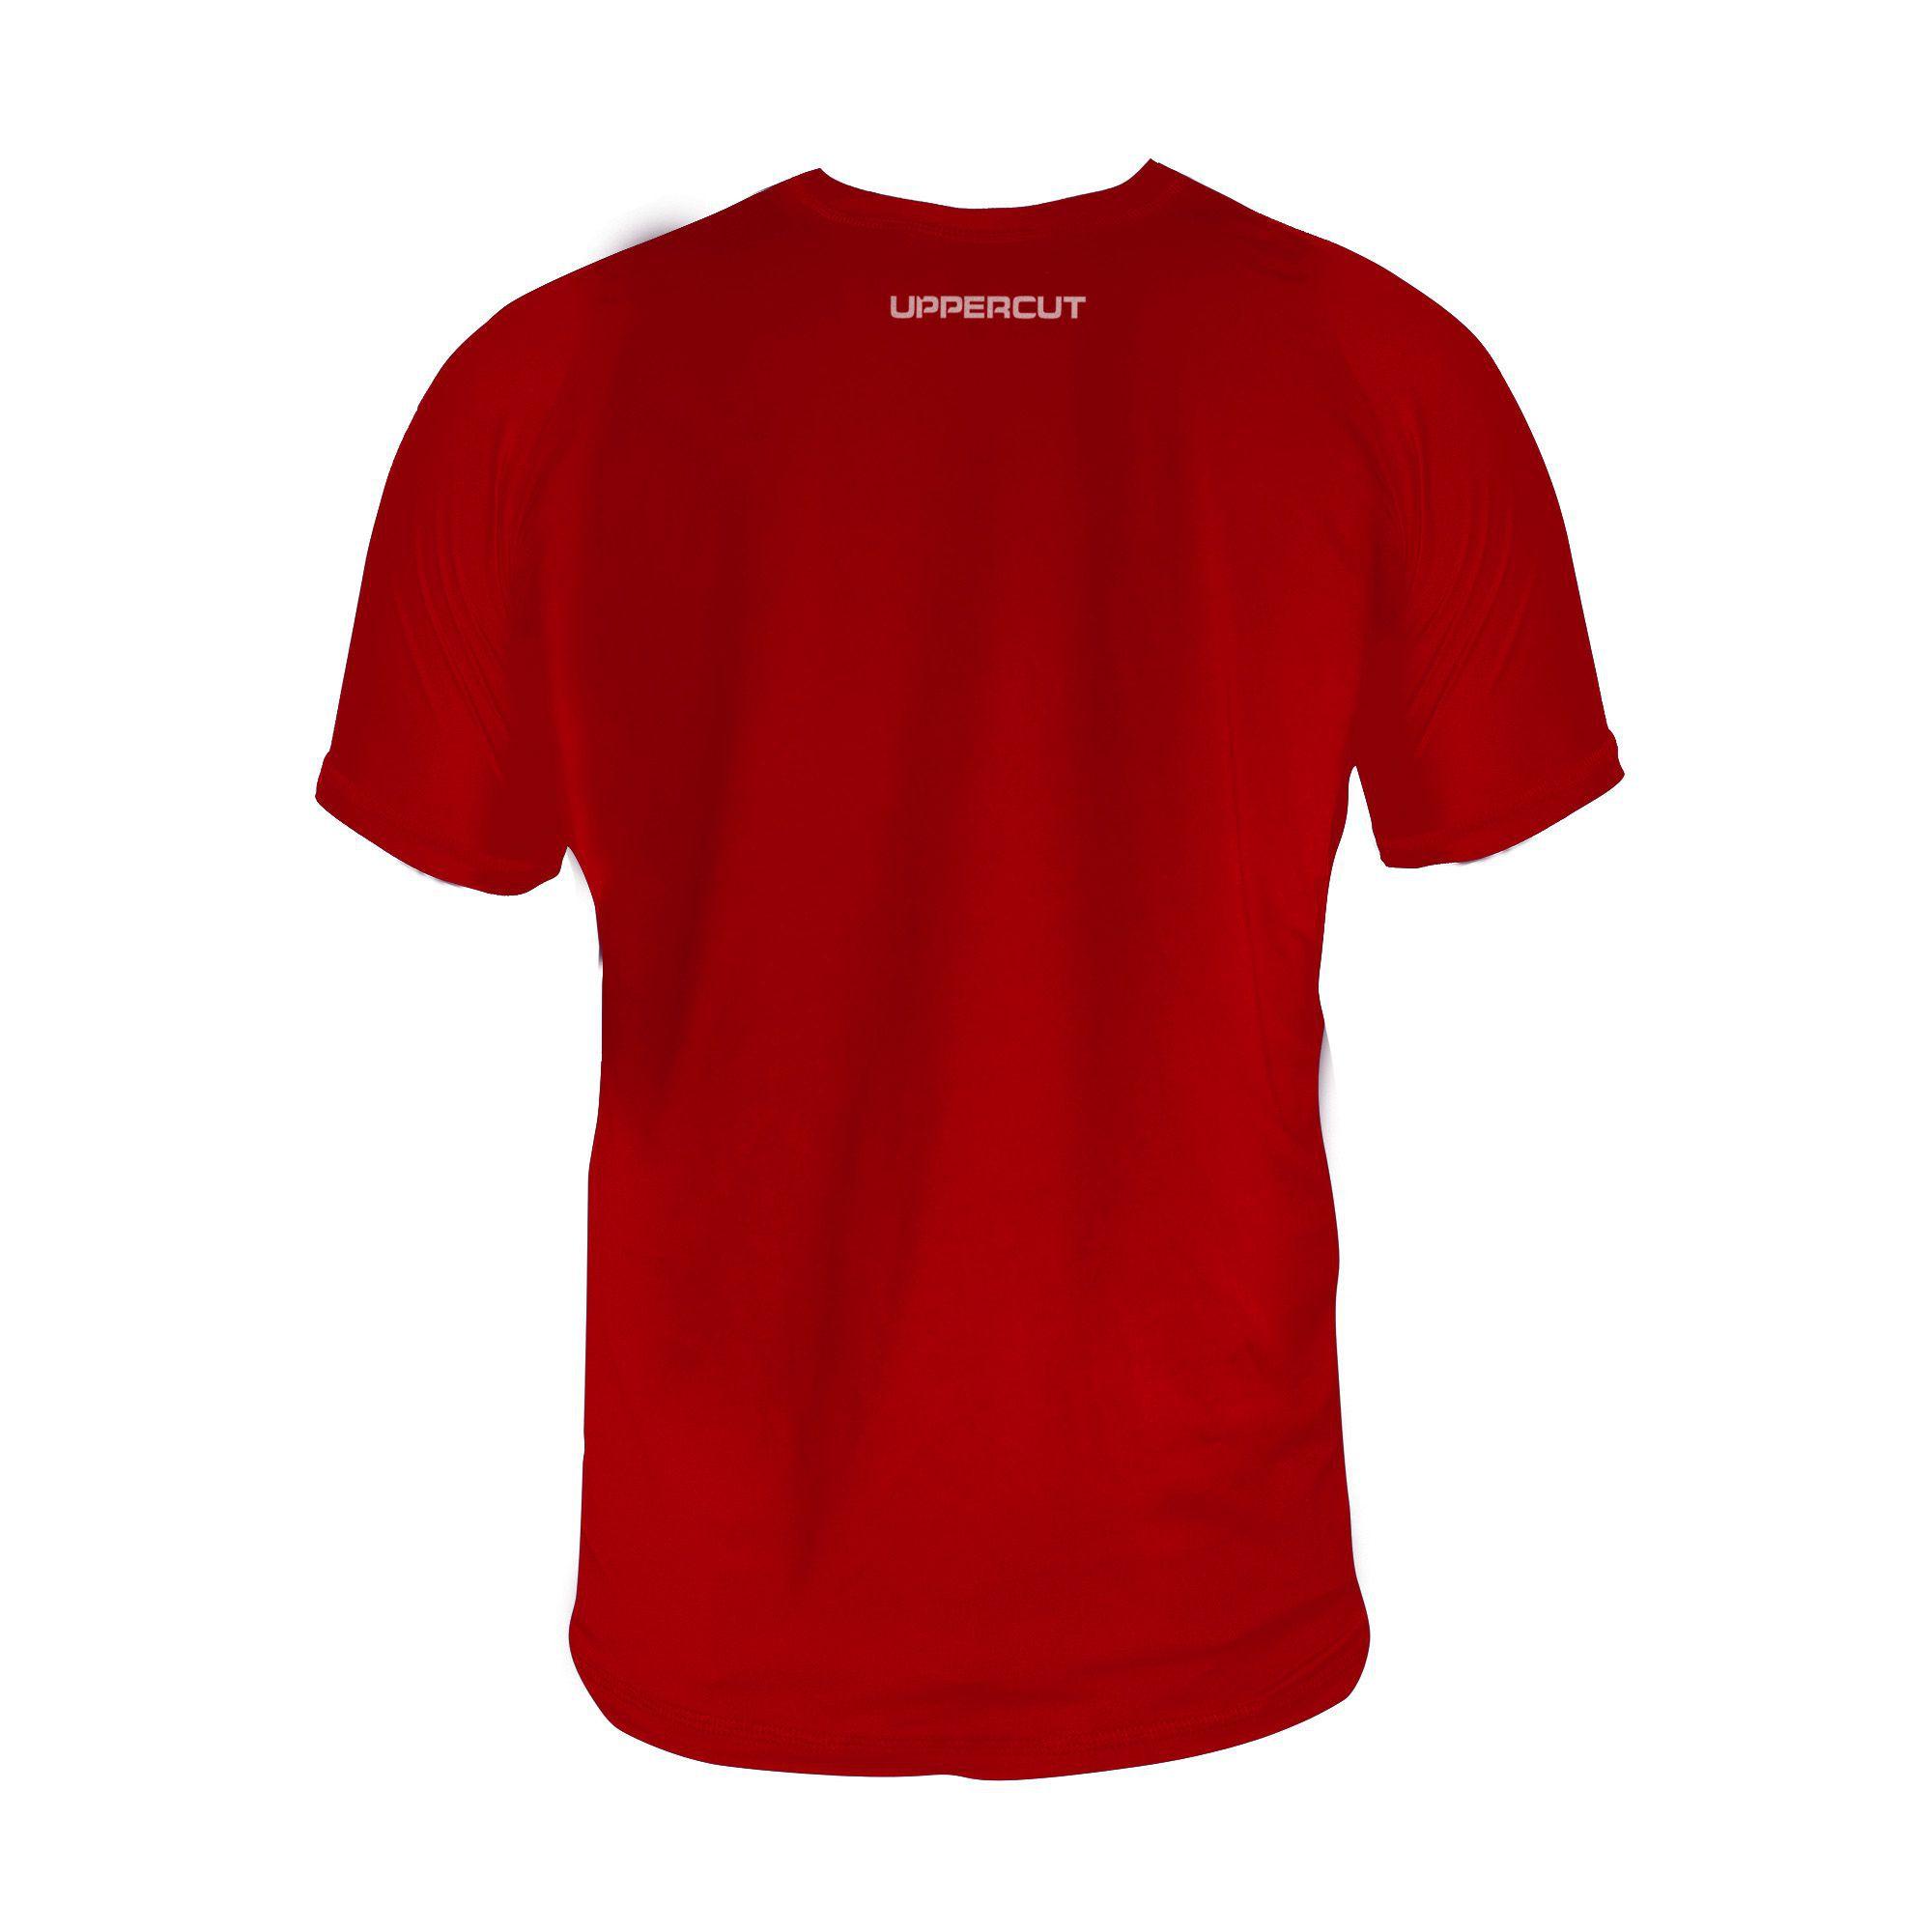 Camisa Jiu-Jitsu Vermelha Uppercut Dry U.V